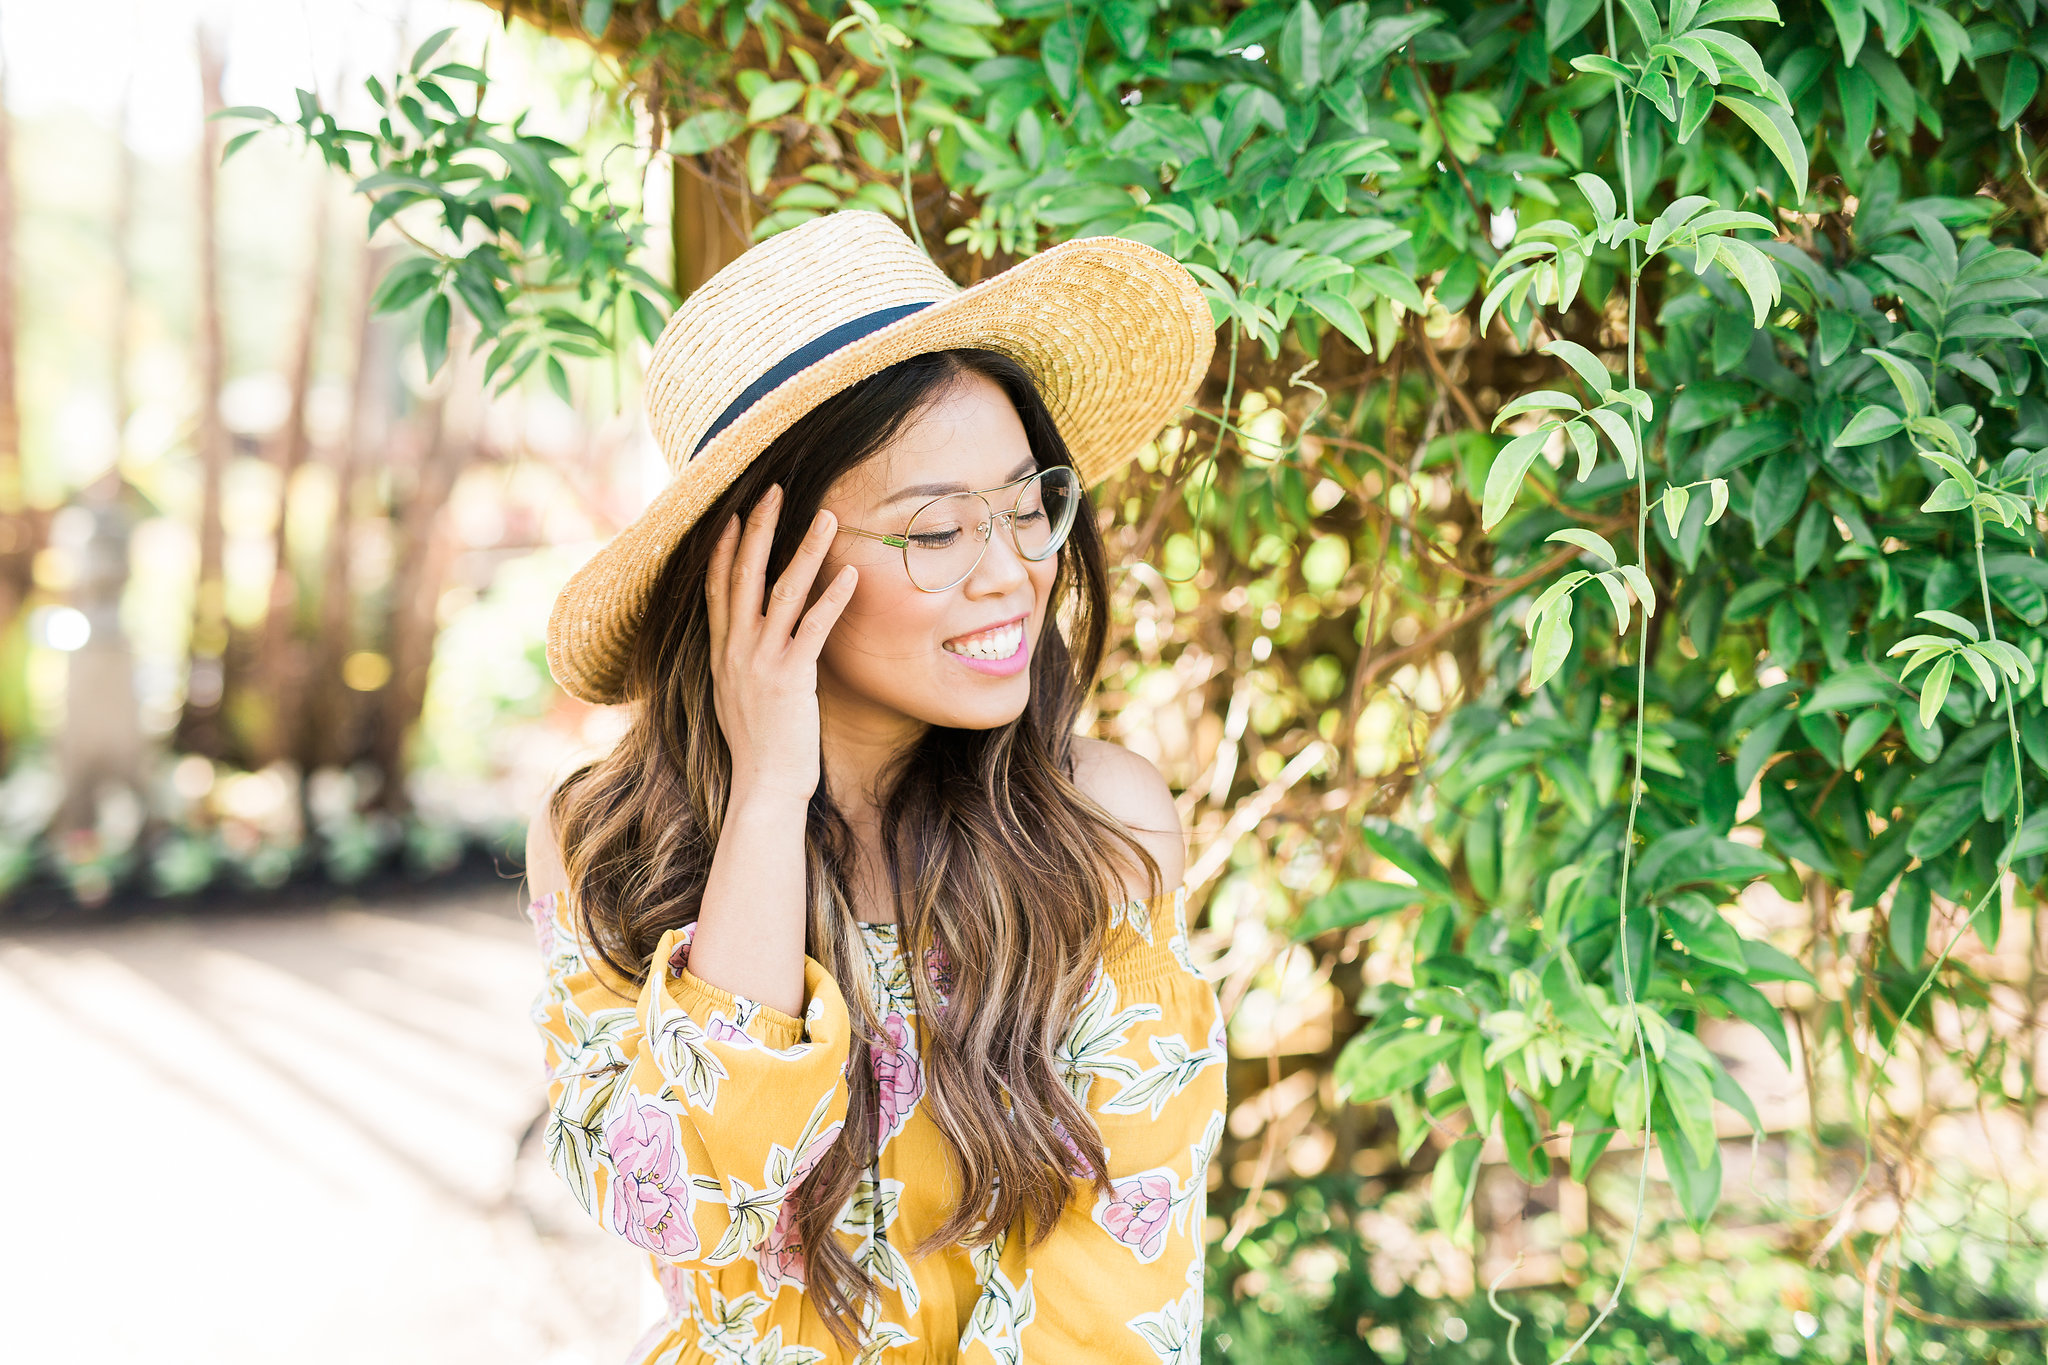 Best Spring Women's Fashion Prescription Eye Glasses Eyeconic Joyfullygreen Chloe Aviators6.jpg